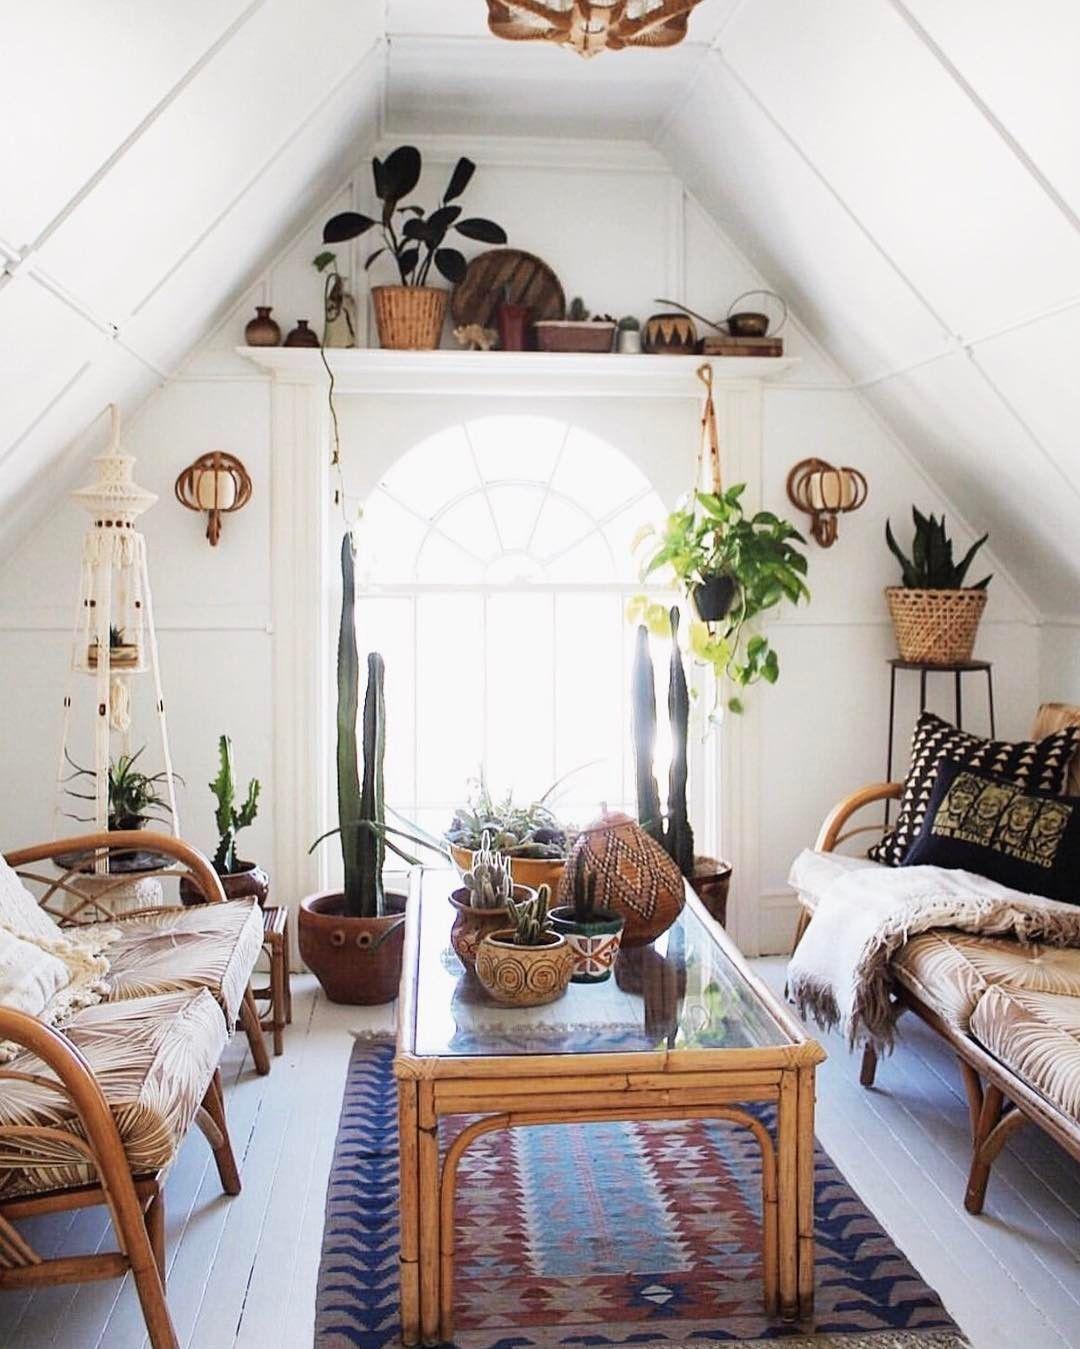 Above window decor  pin by megan pfautz on living space  pinterest  instagram